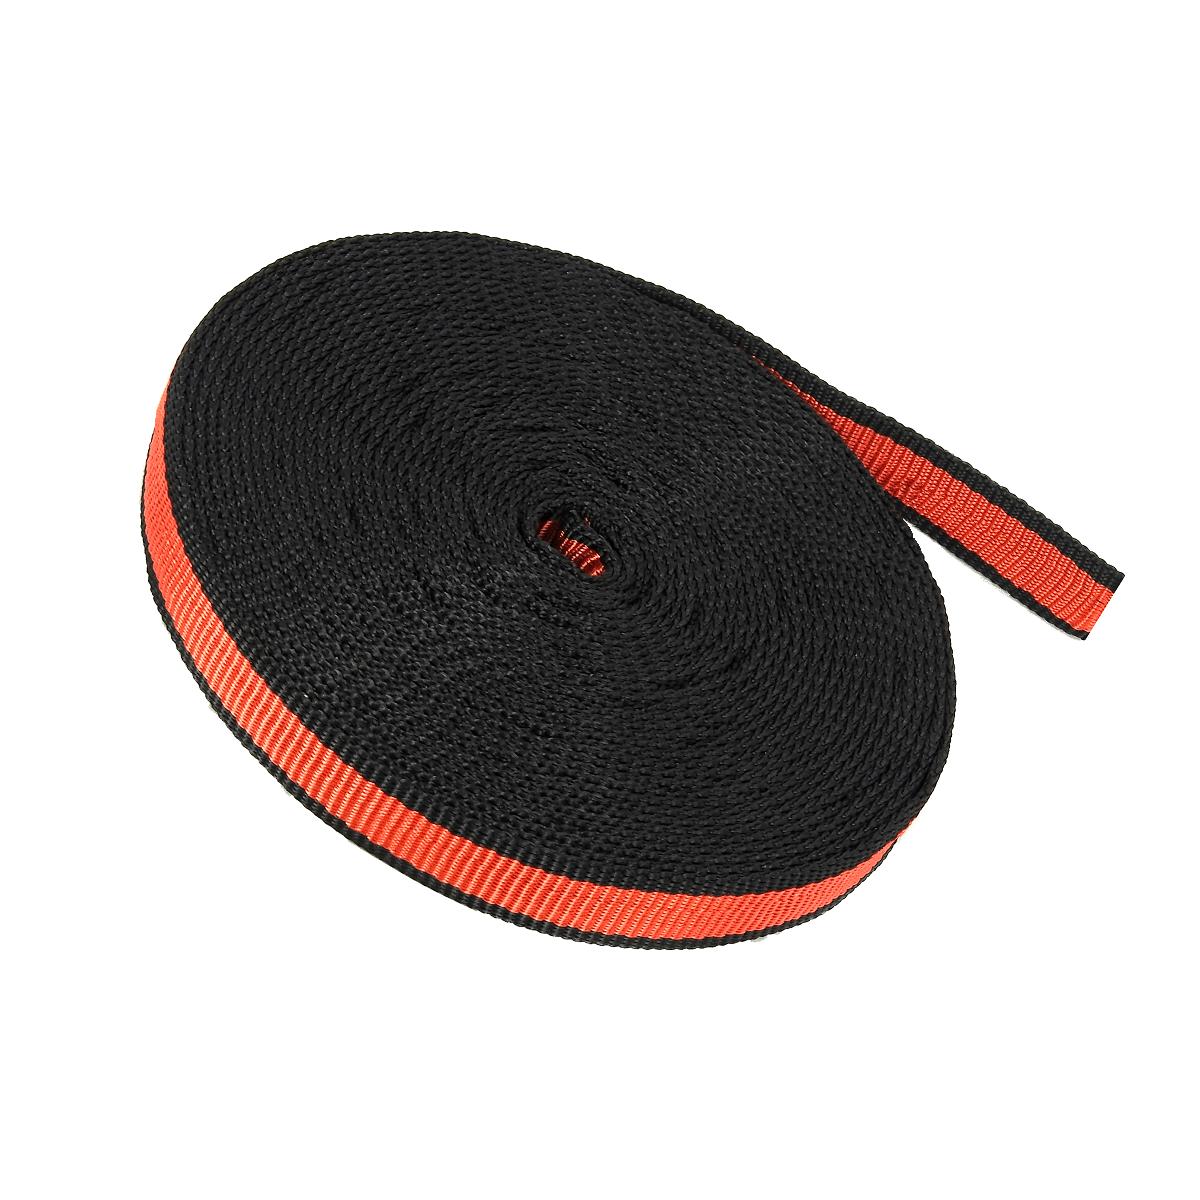 Fita Tubular 20mm 16kN Vermelha (Rolo 10 metros) - Exclusividade ALPIMONTE